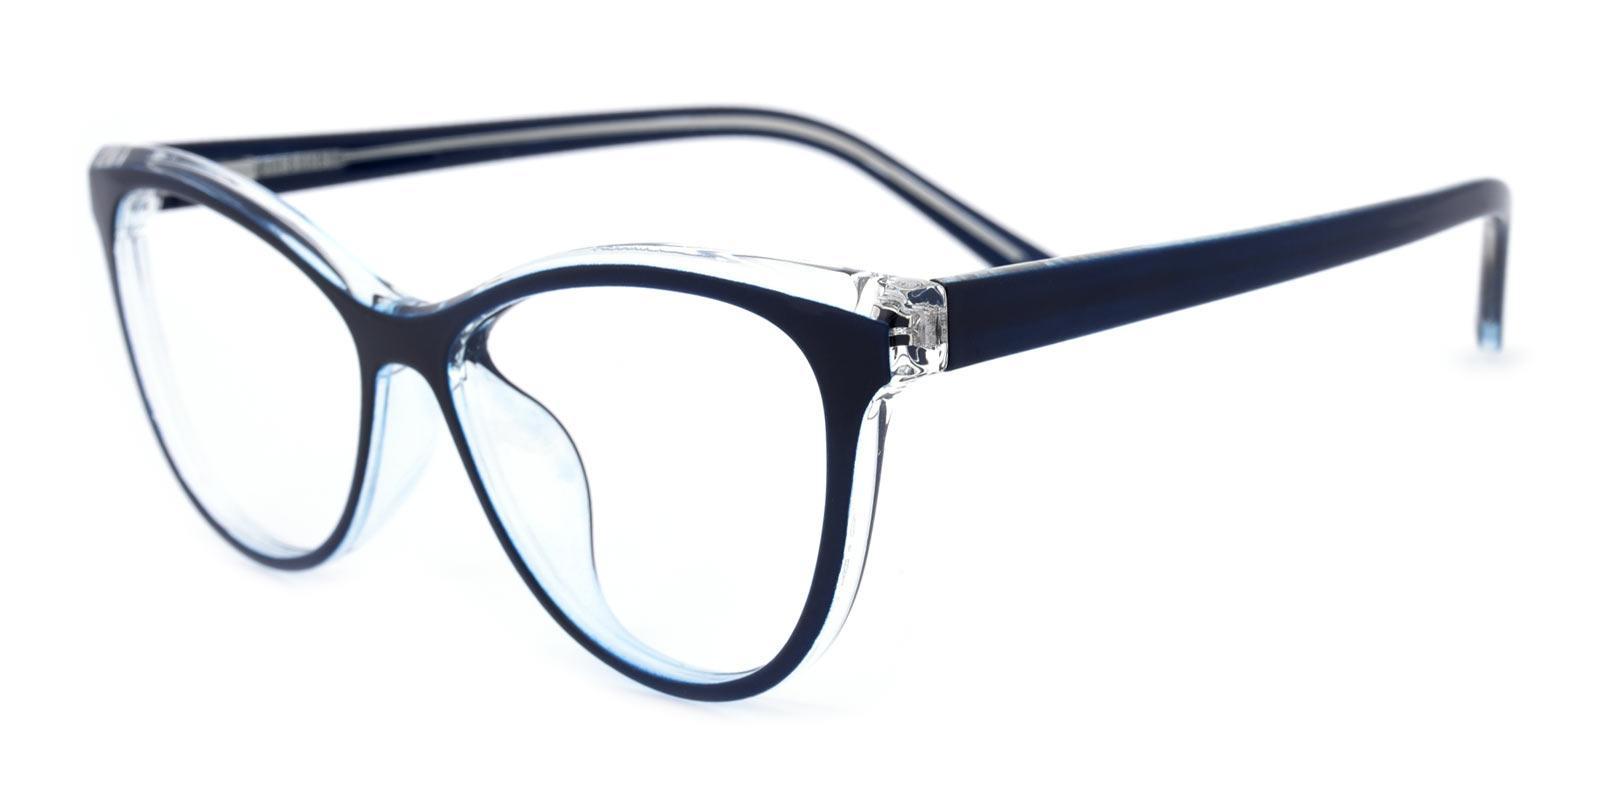 Diana-Blue-Cat-TR-Eyeglasses-detail